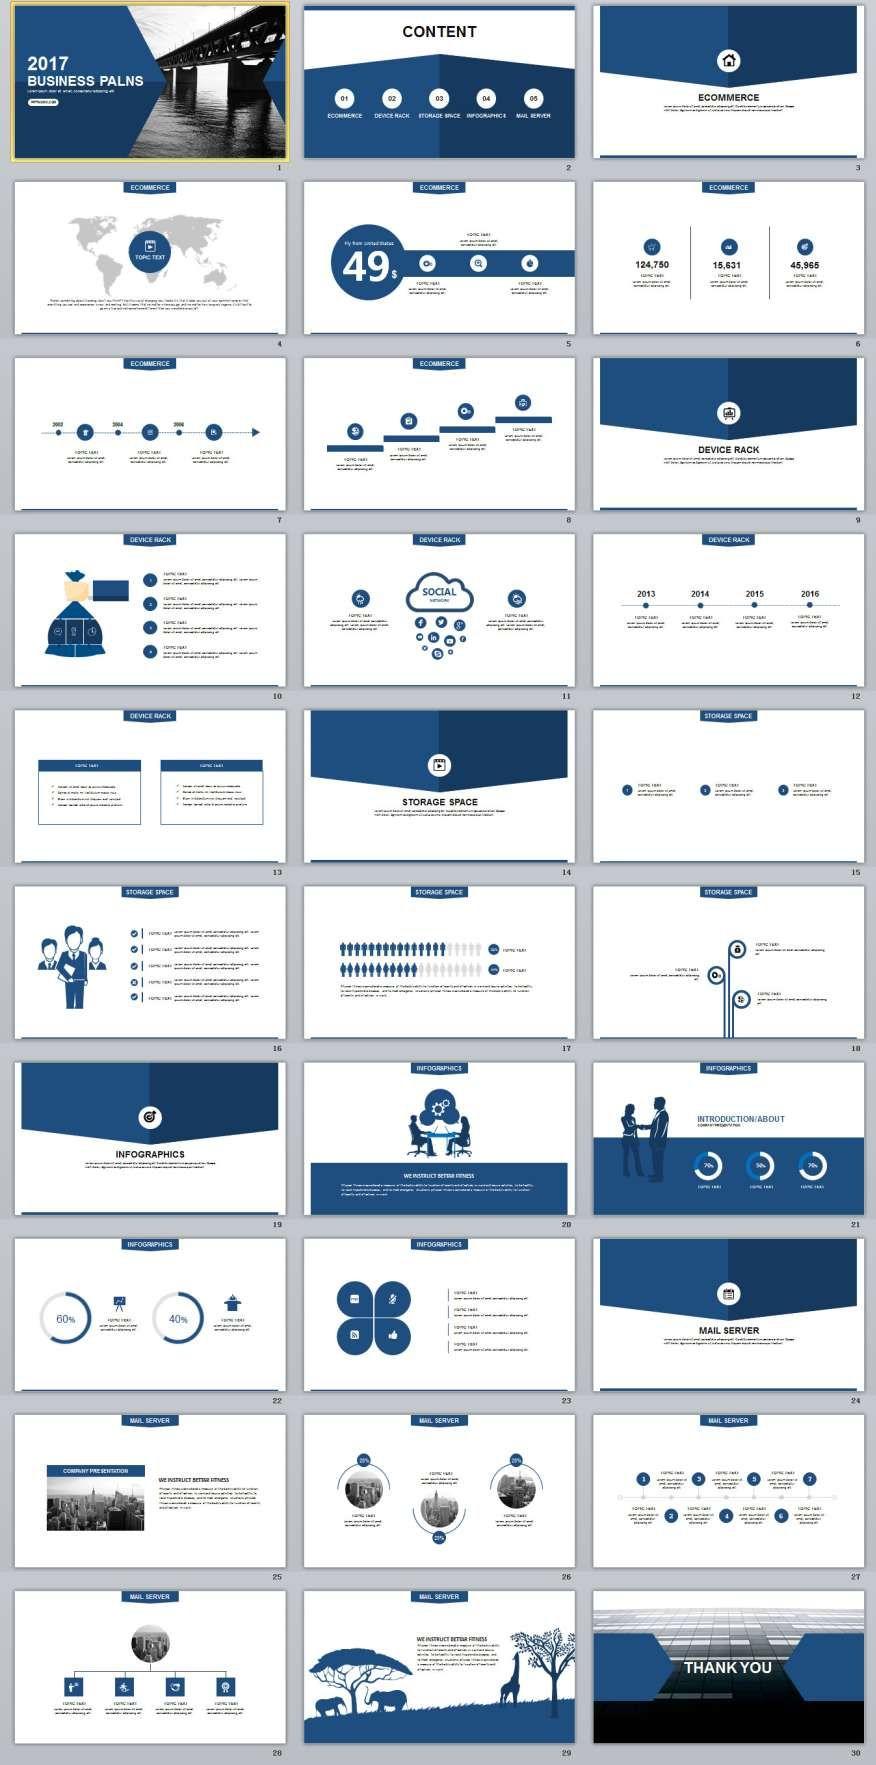 30 blue business plan powerpoint templates